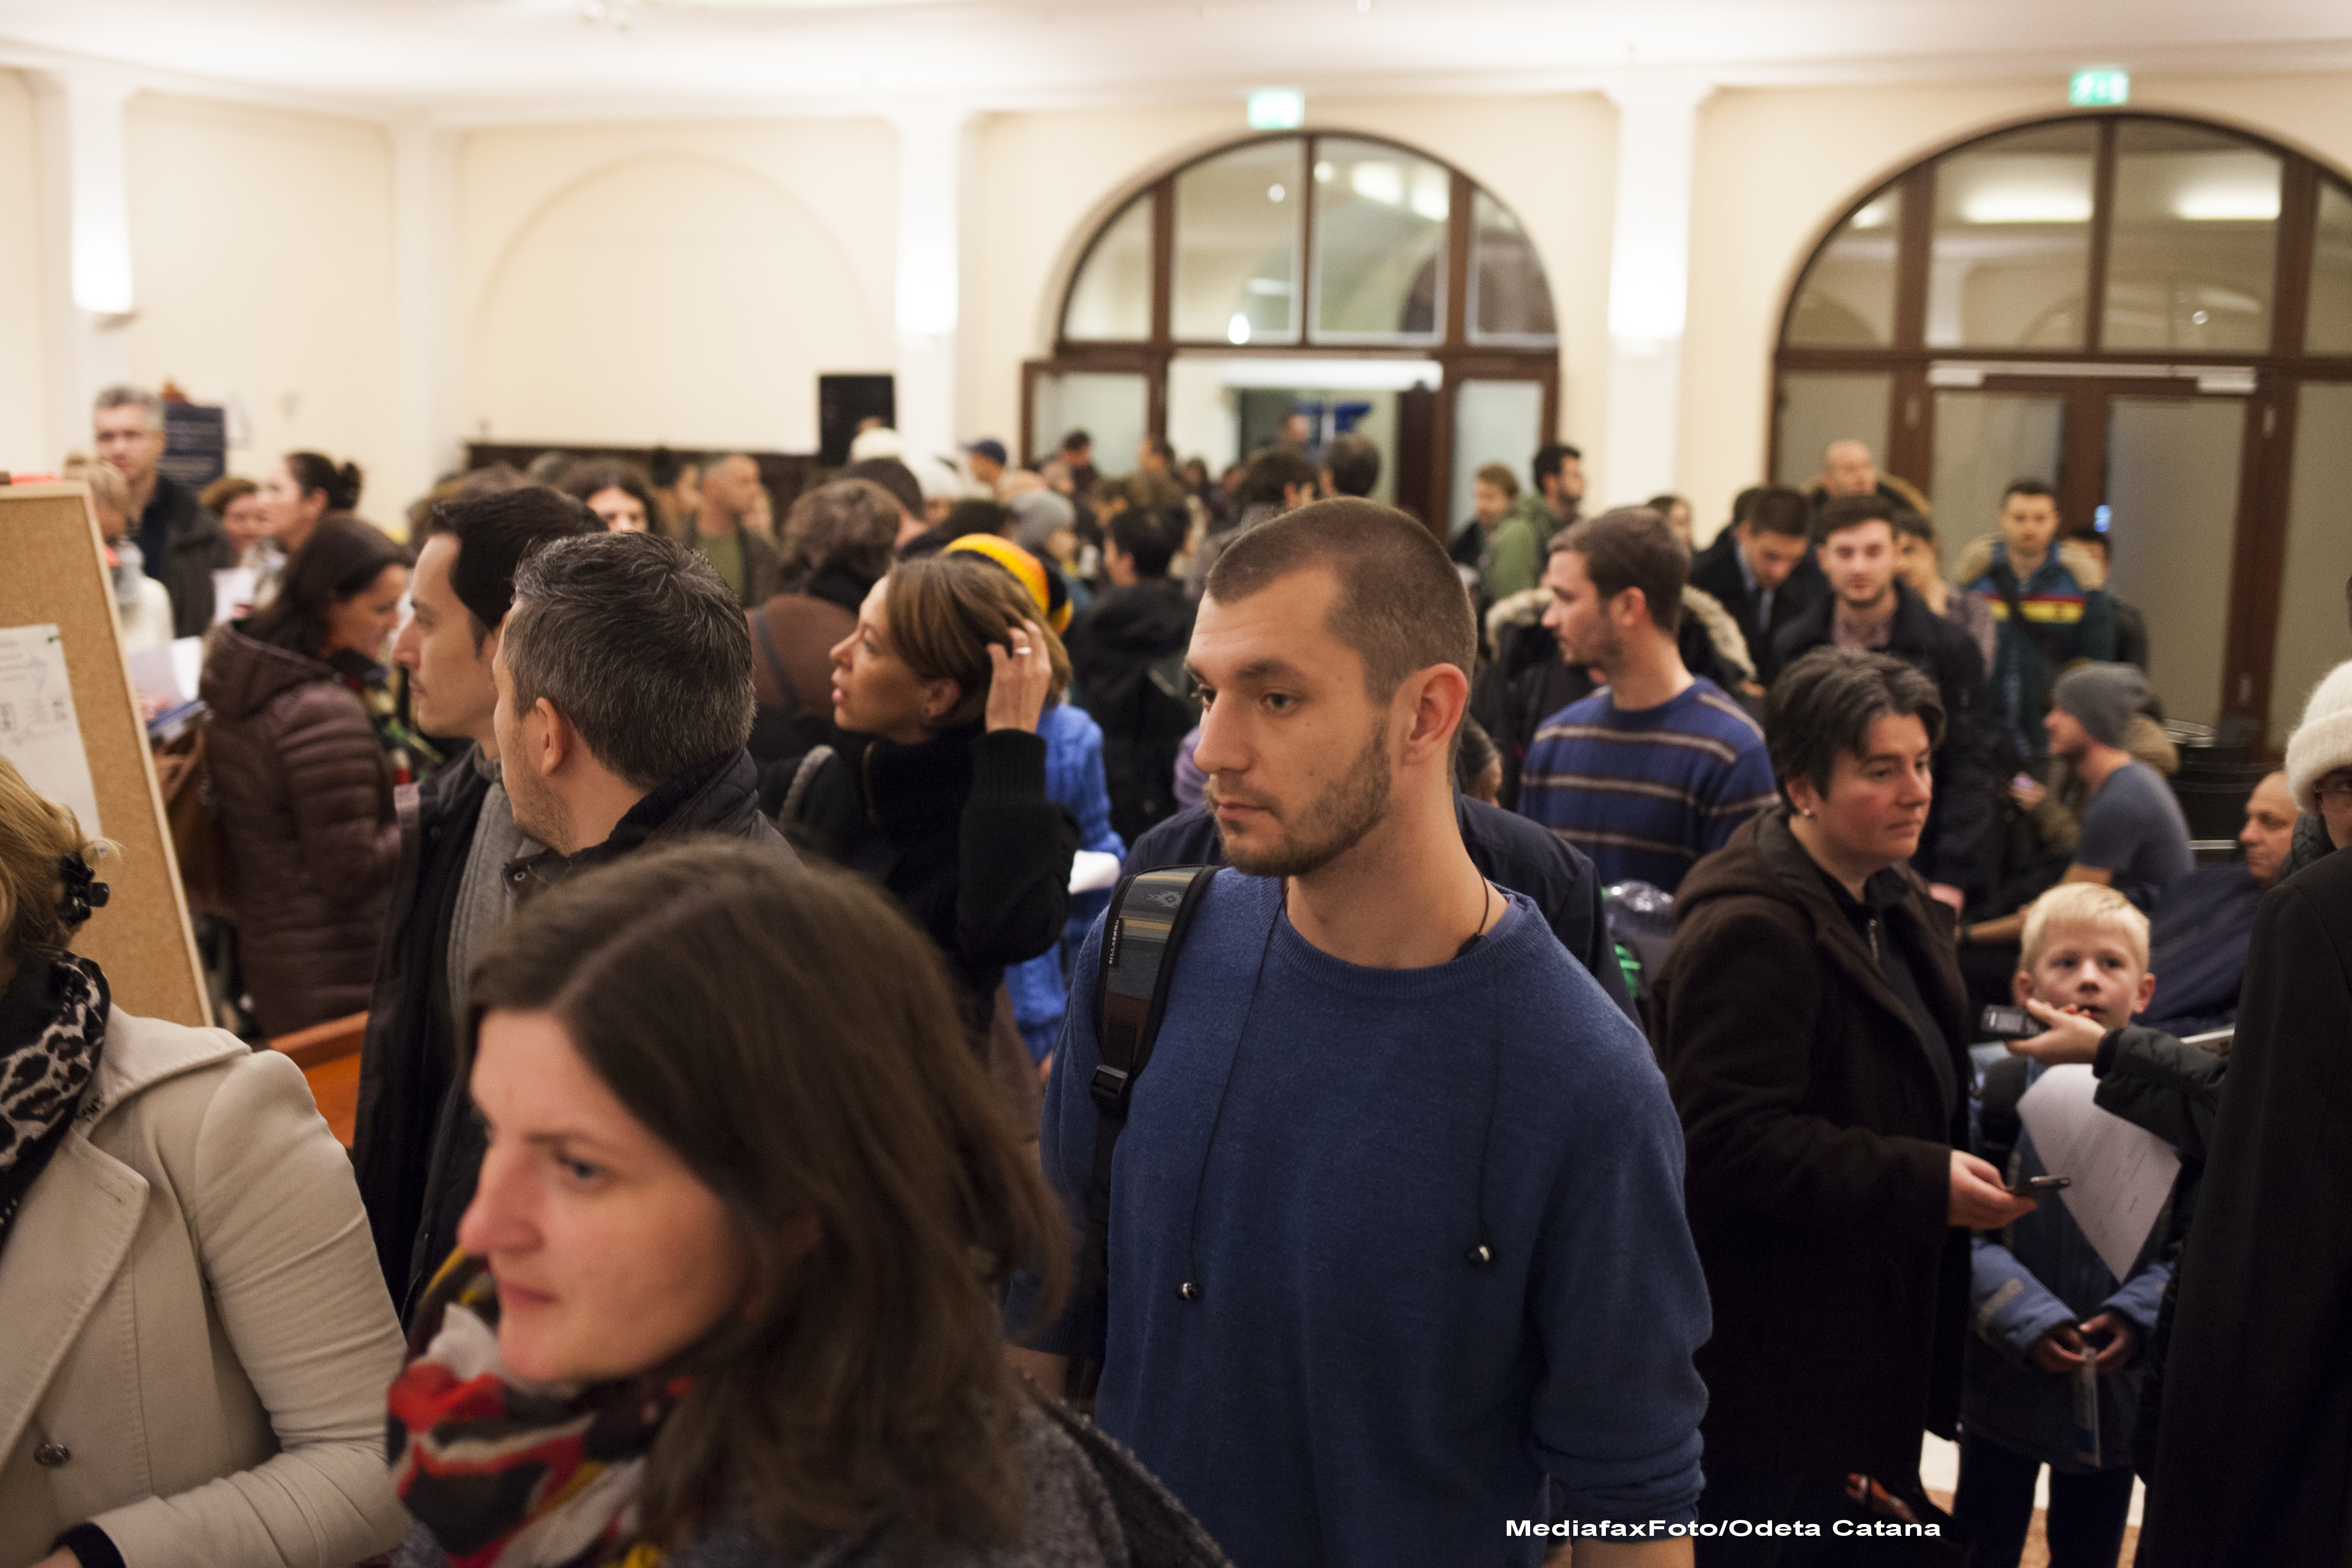 ALEGERI PREZIDENTIALE 2014. Peste 360.000 de voturi s-au inregistrat in diaspora pana la ora 23. Revolte la Paris si Torino